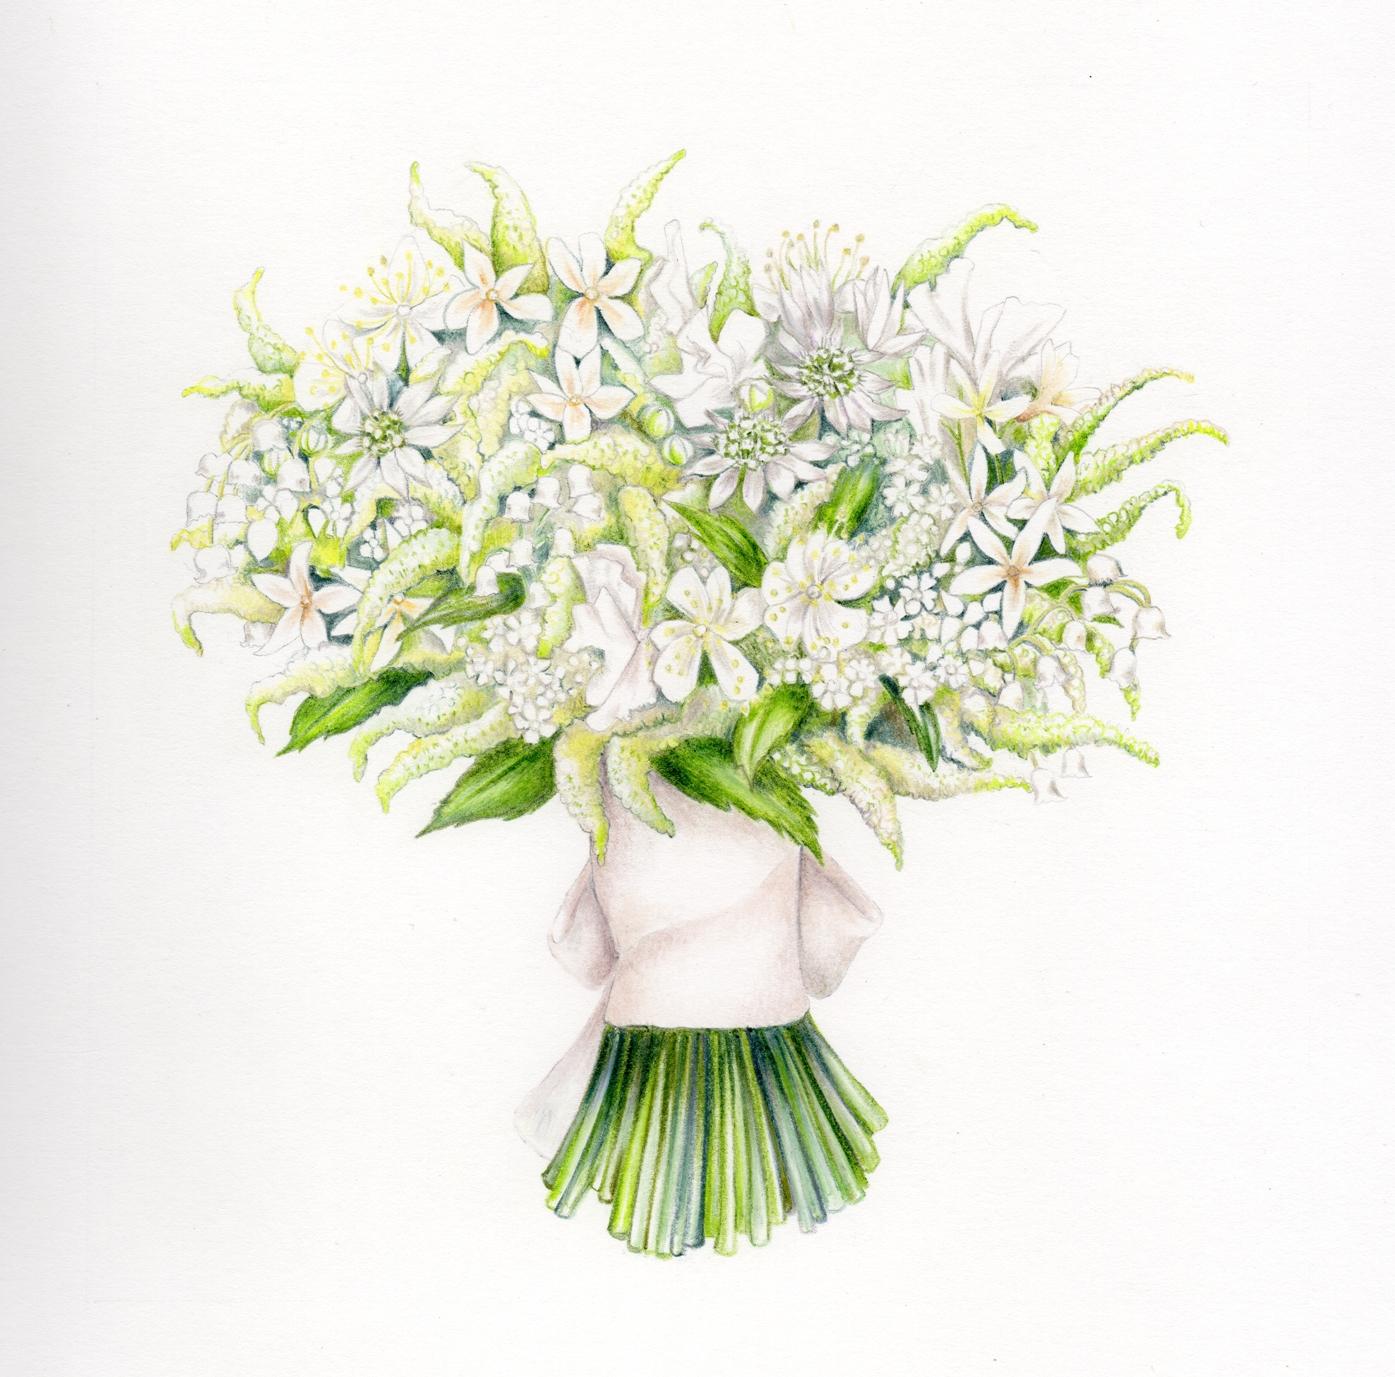 Duchess of Sussex wedding bouquet illustration by Charlotte Argyrou